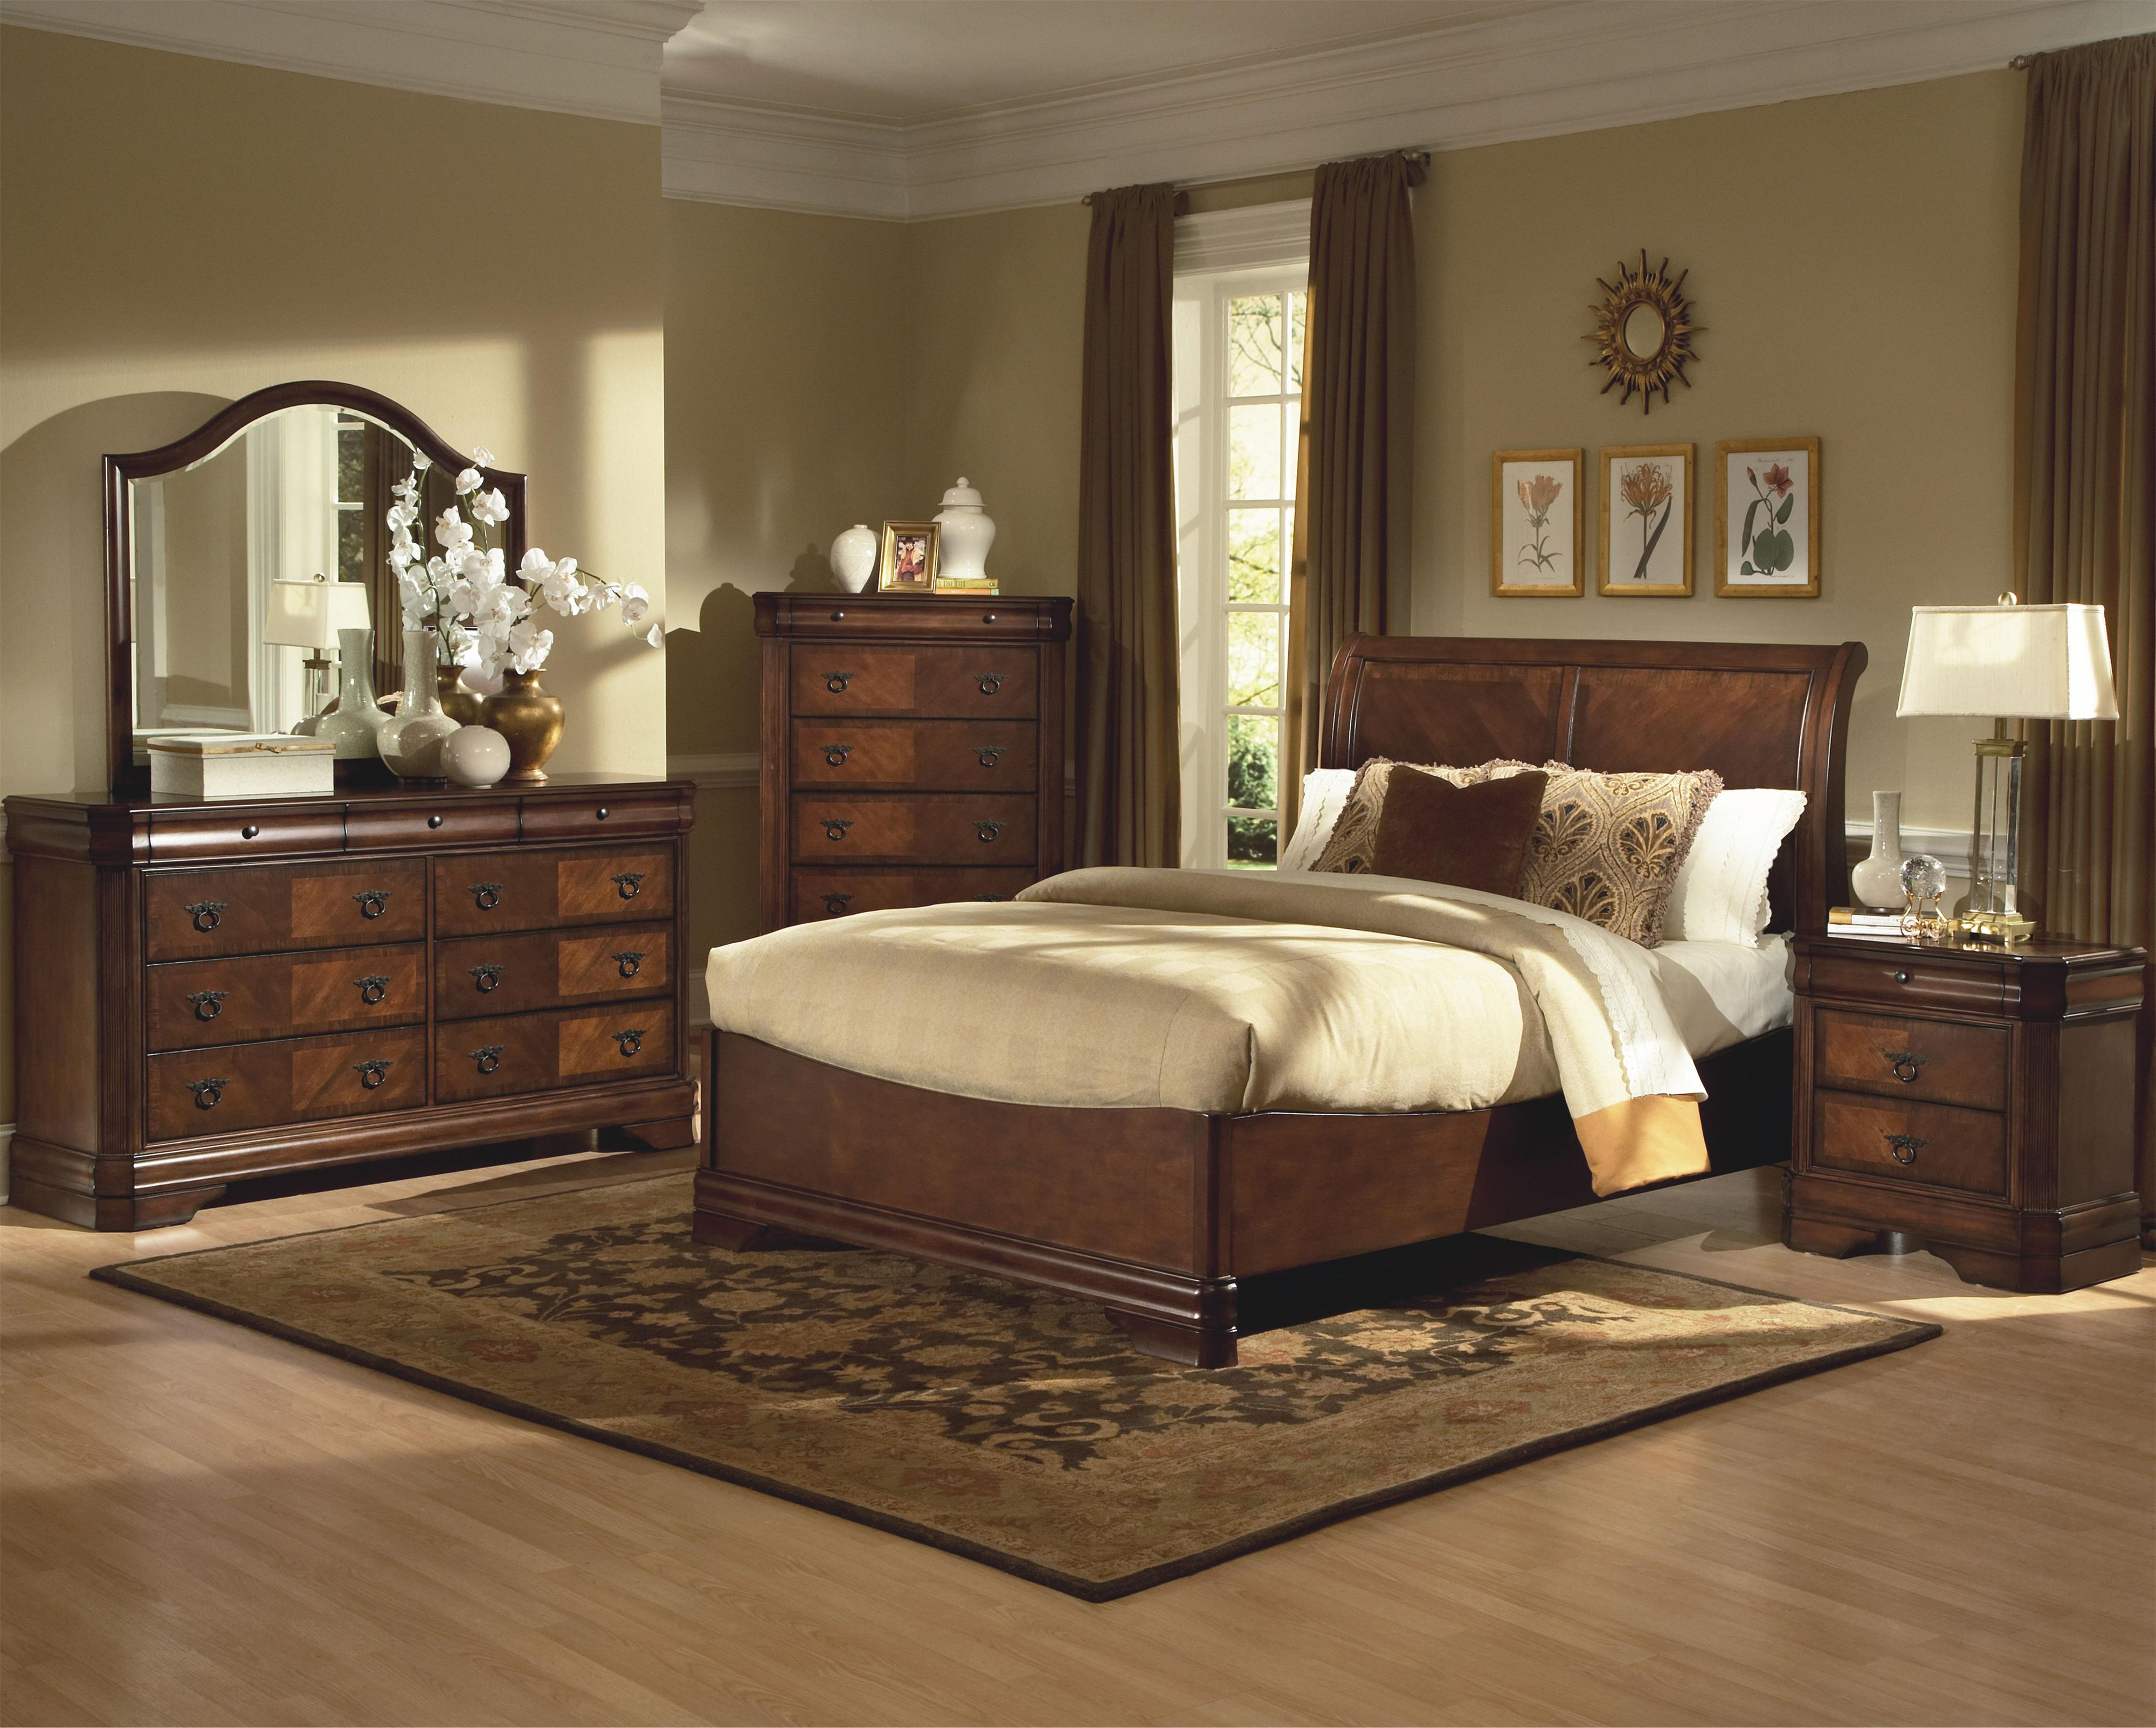 New Classic Sheridan King Bedroom Group - Item Number: 005 K Bedroom Group 1